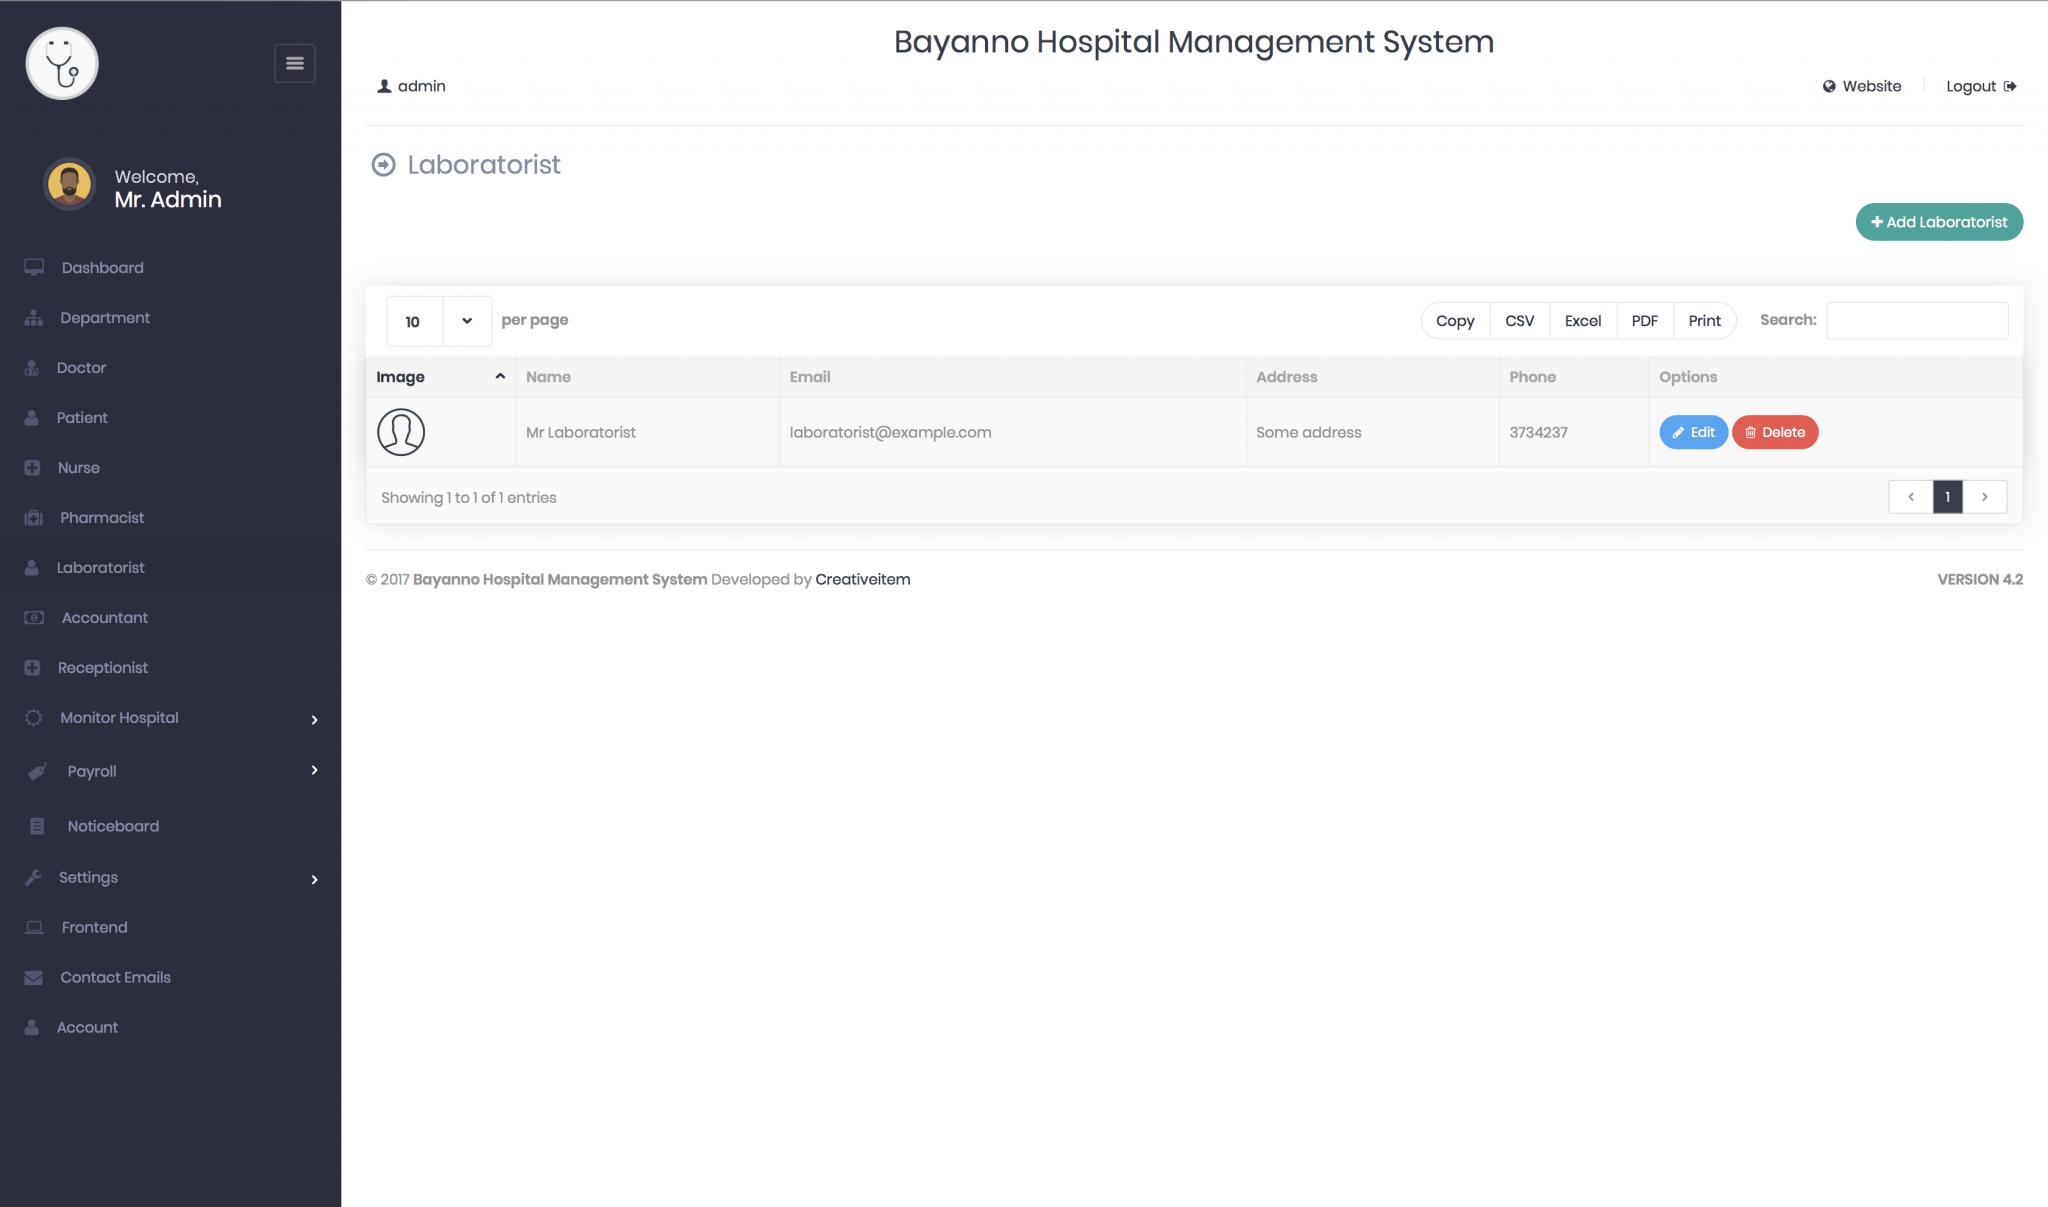 Sistema Hospital - Bayanno Hospital Management System